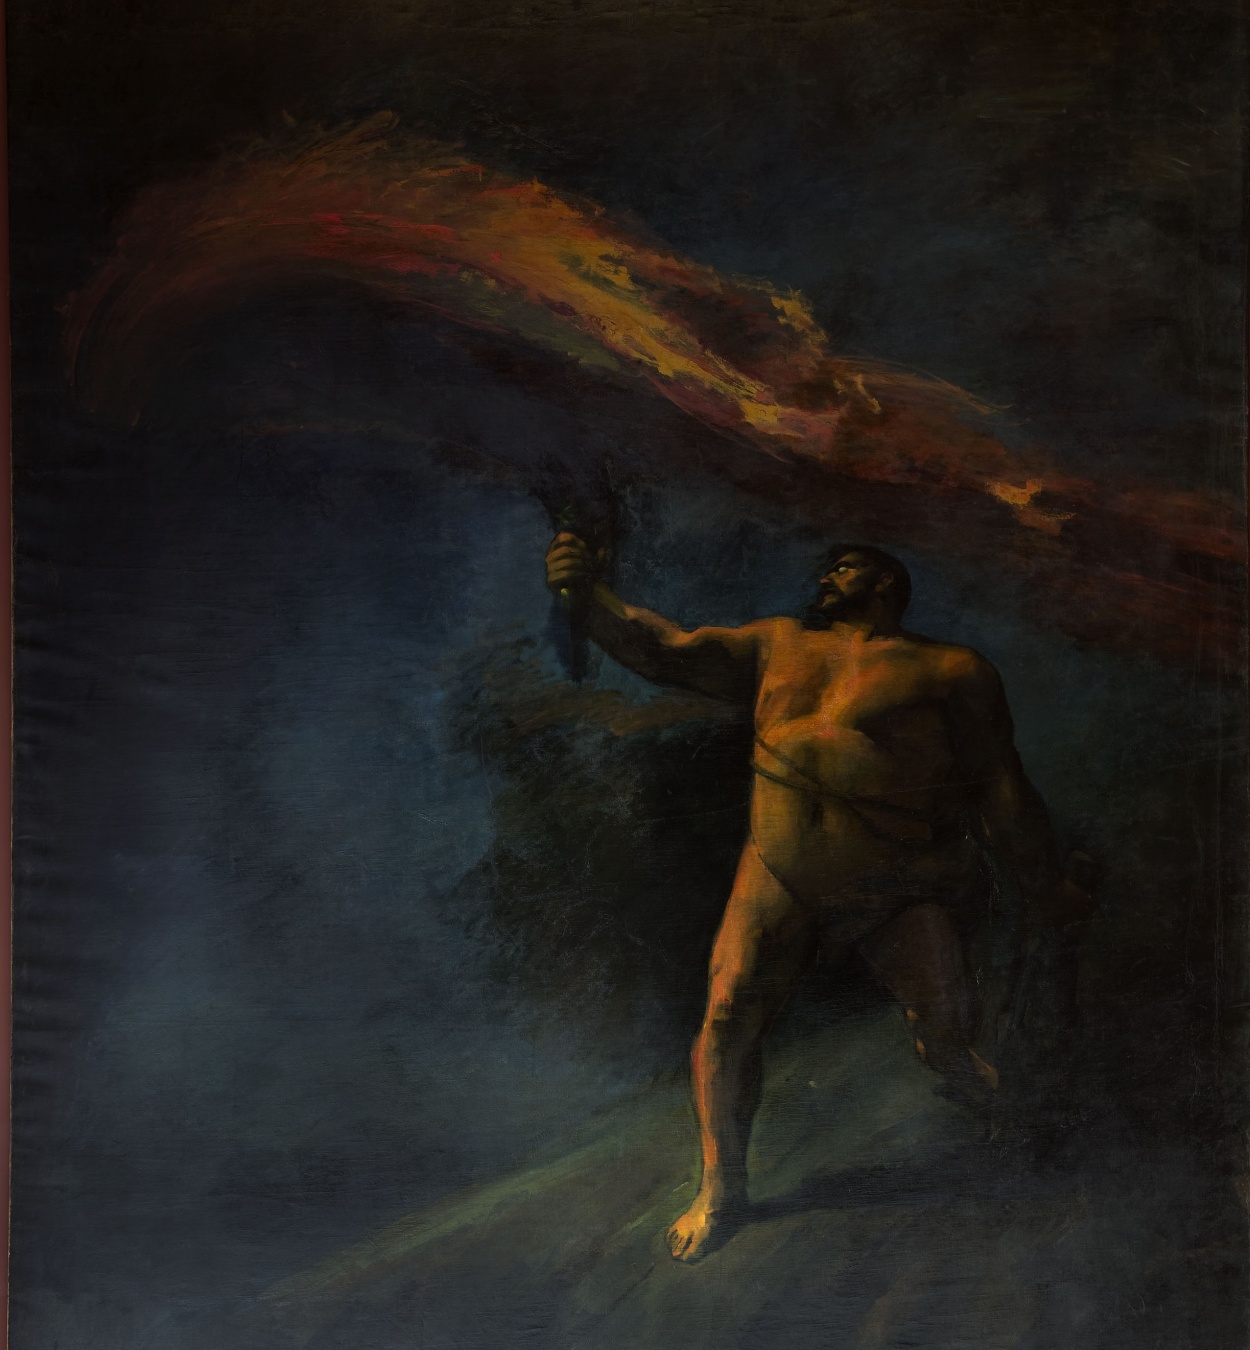 Aleix Clapés - Hercules Searching for the Hesperides - Circa 1890